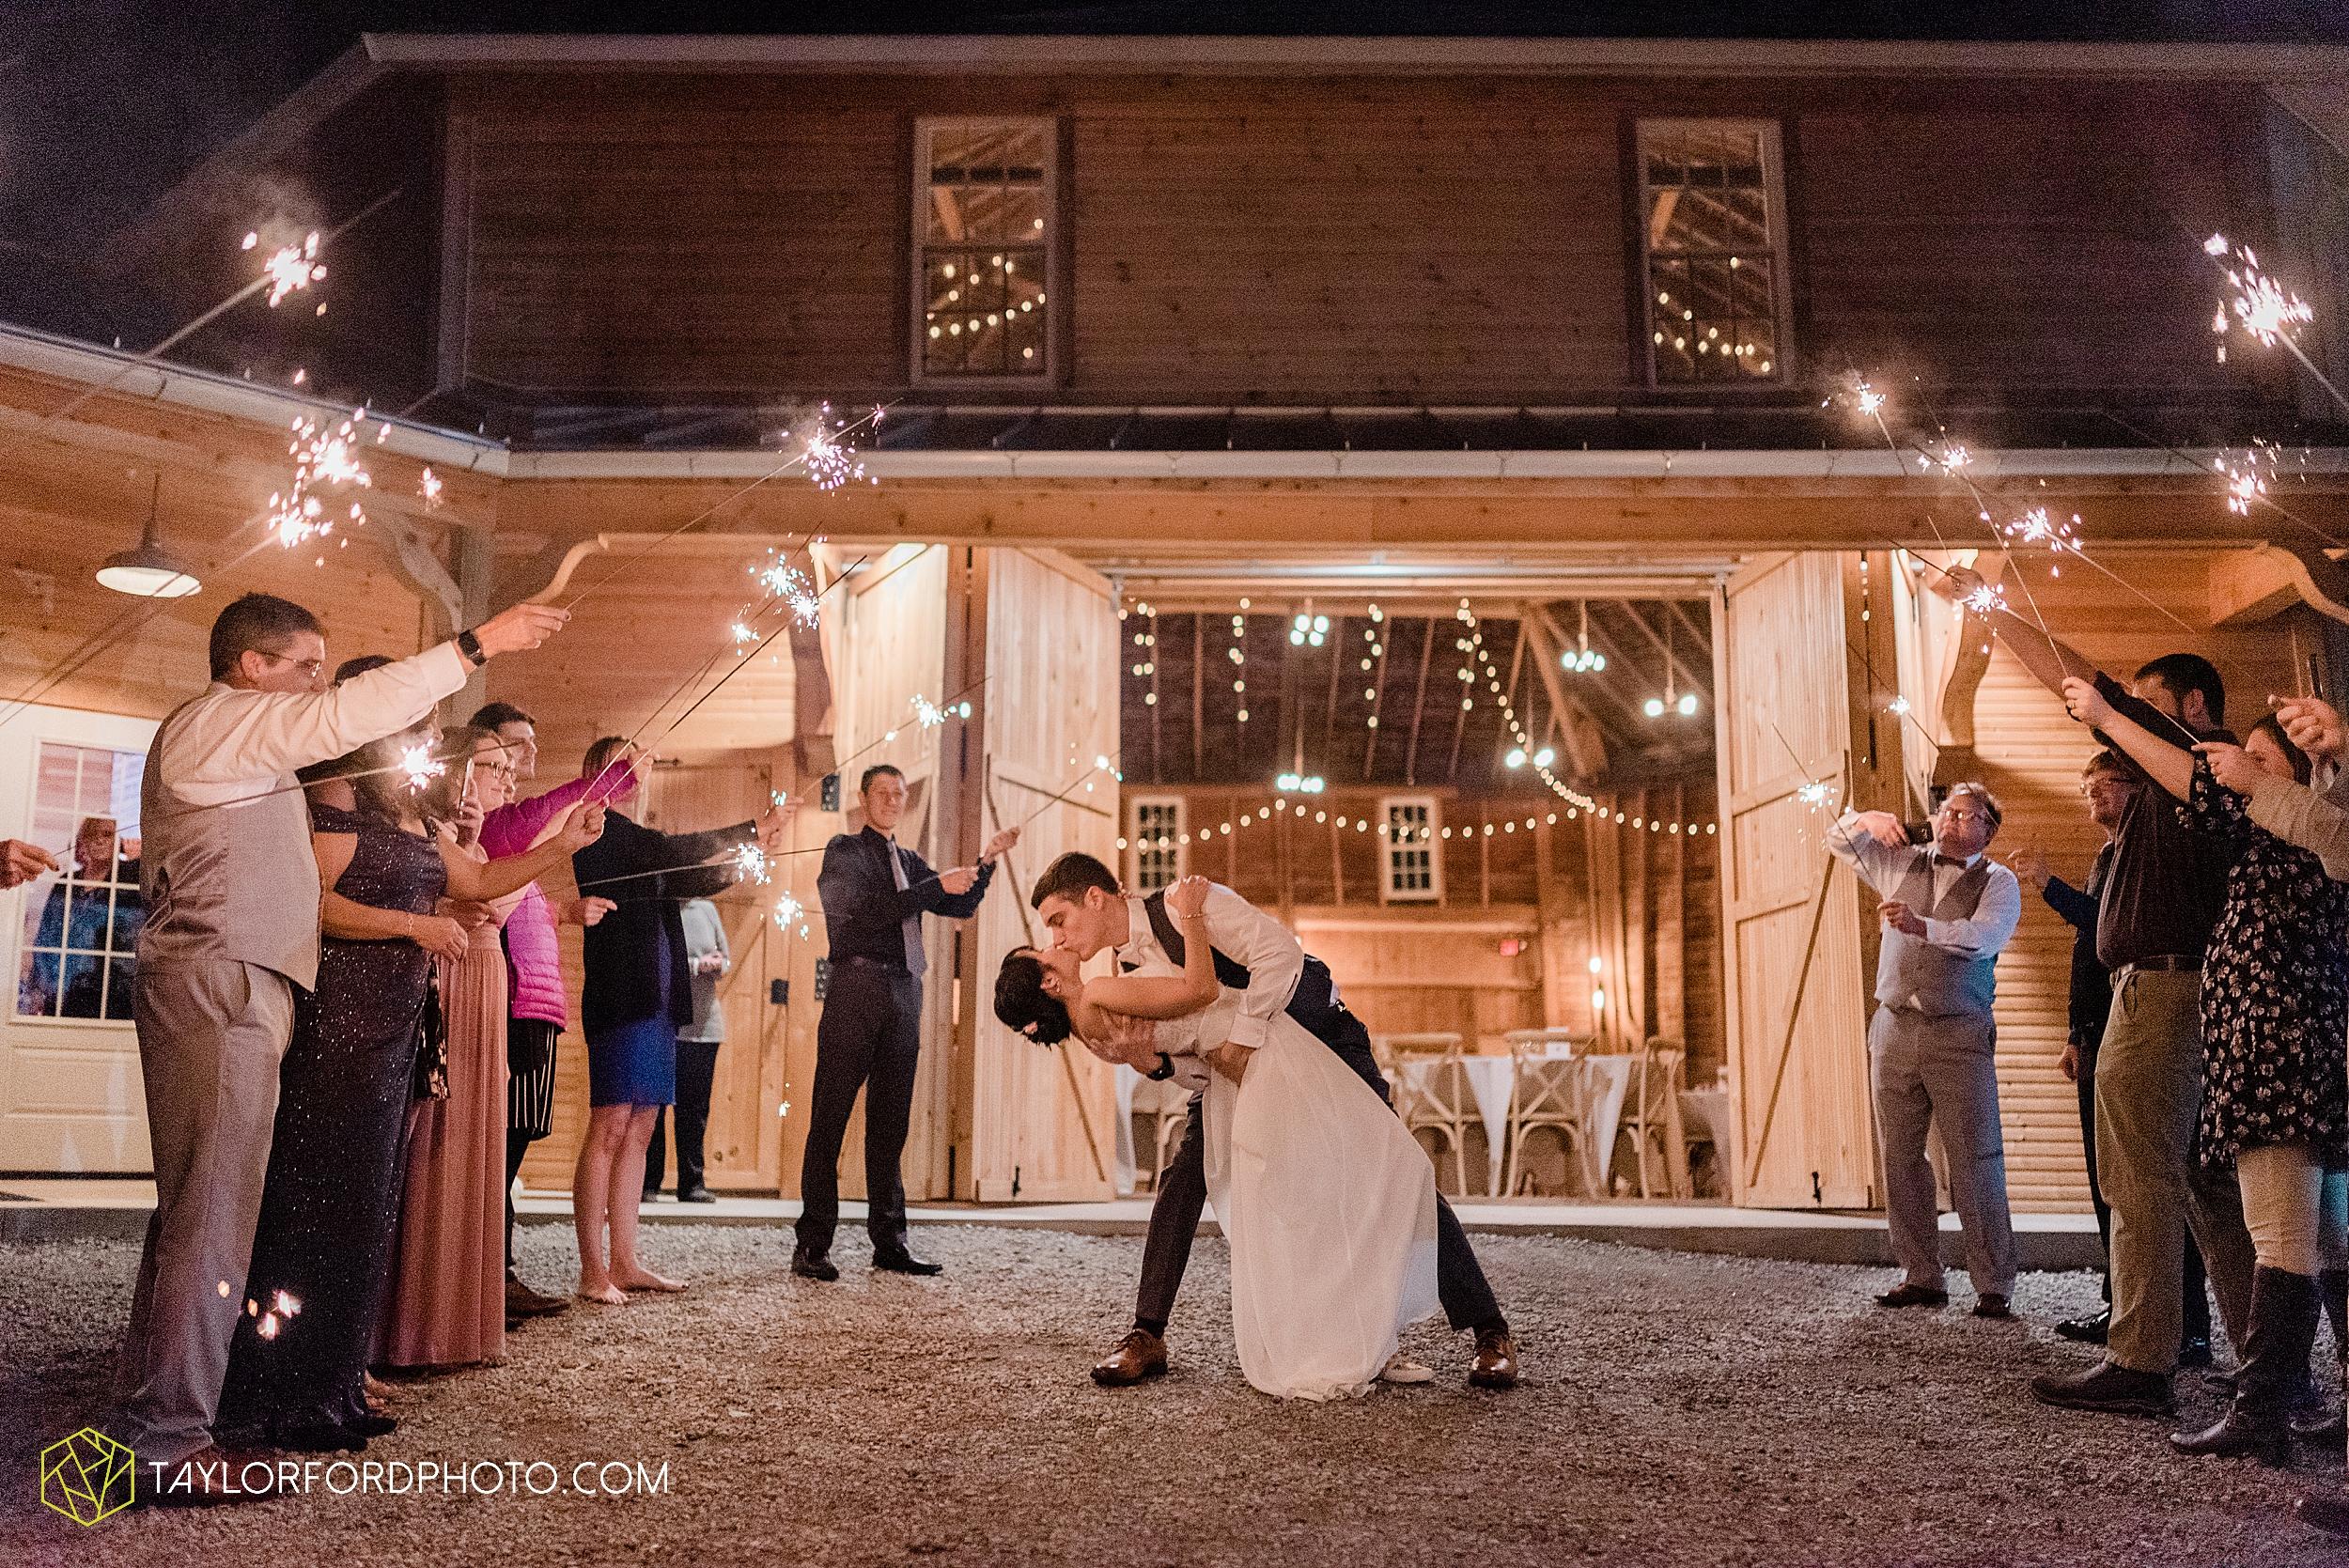 marissa-nicole-nick-daeger-orrmont-estate-farm-wedding-piqua-dayton-troy-ohio-fall-photographer-taylor-ford-photography_1577.jpg